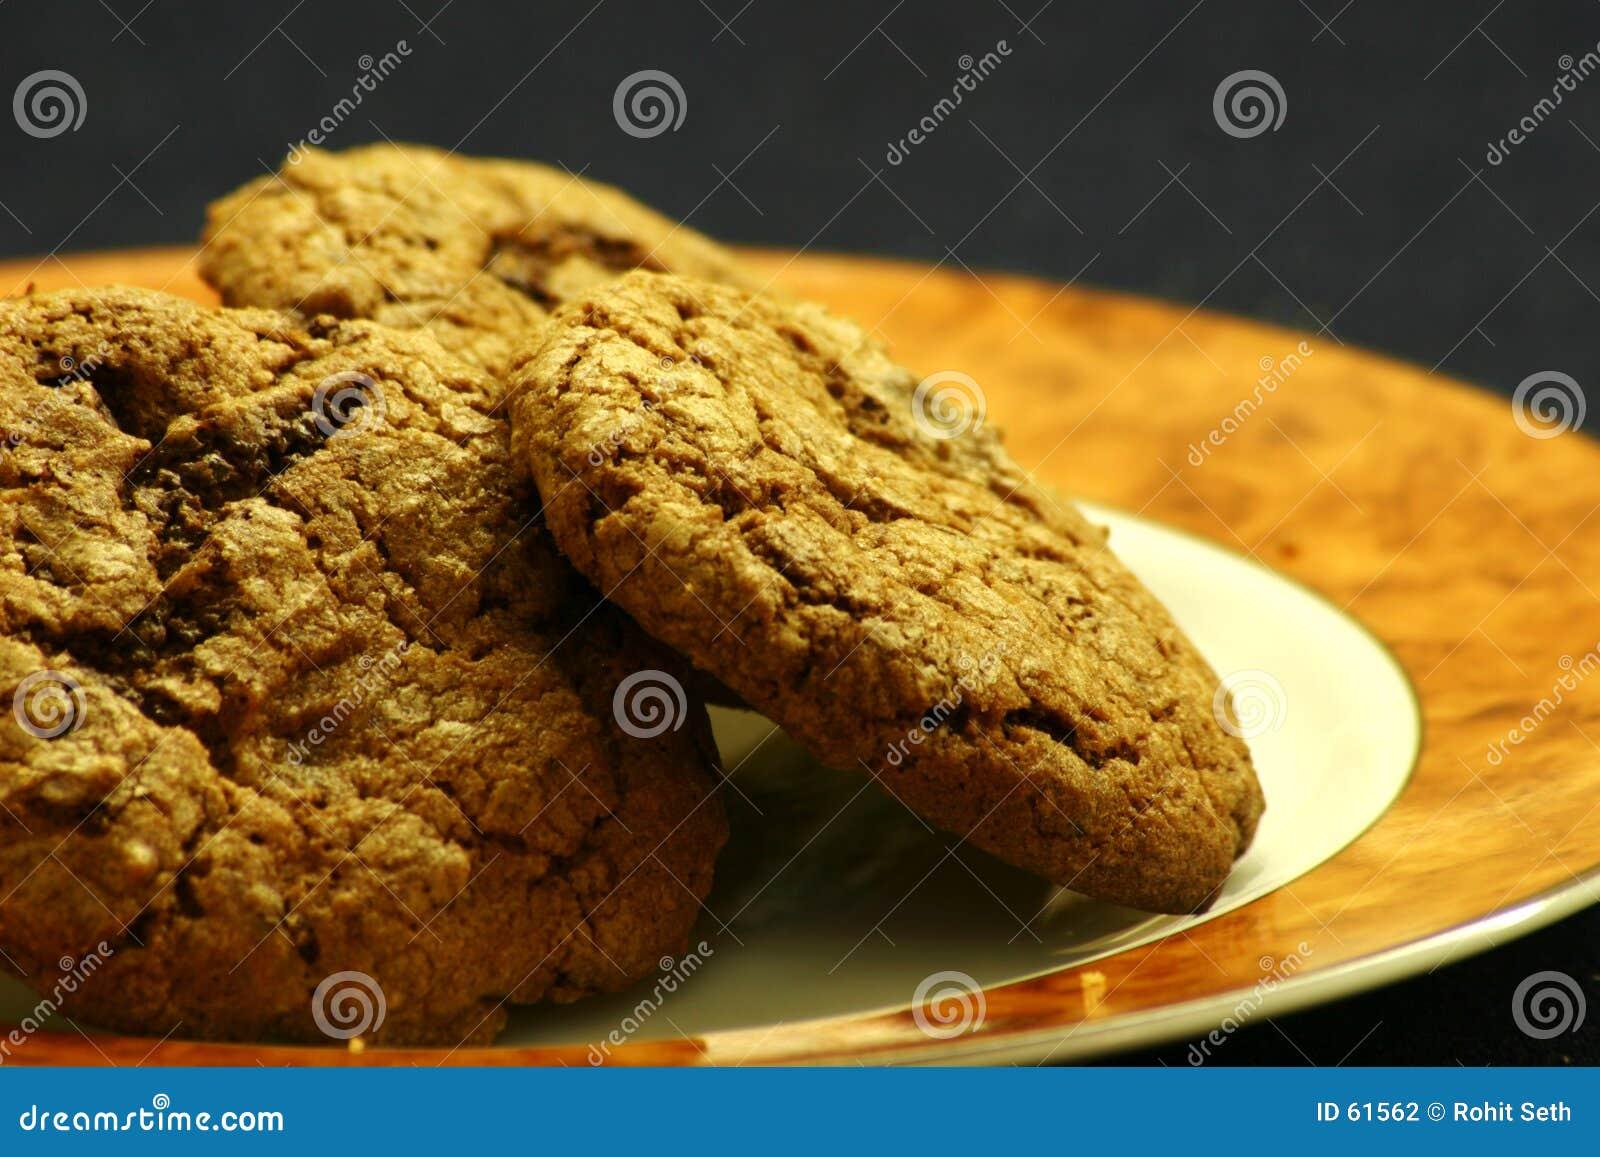 Download μπισκότα στοκ εικόνες. εικόνα από φρέσκος, snack, τσιπ, σοκολάτα - 61562